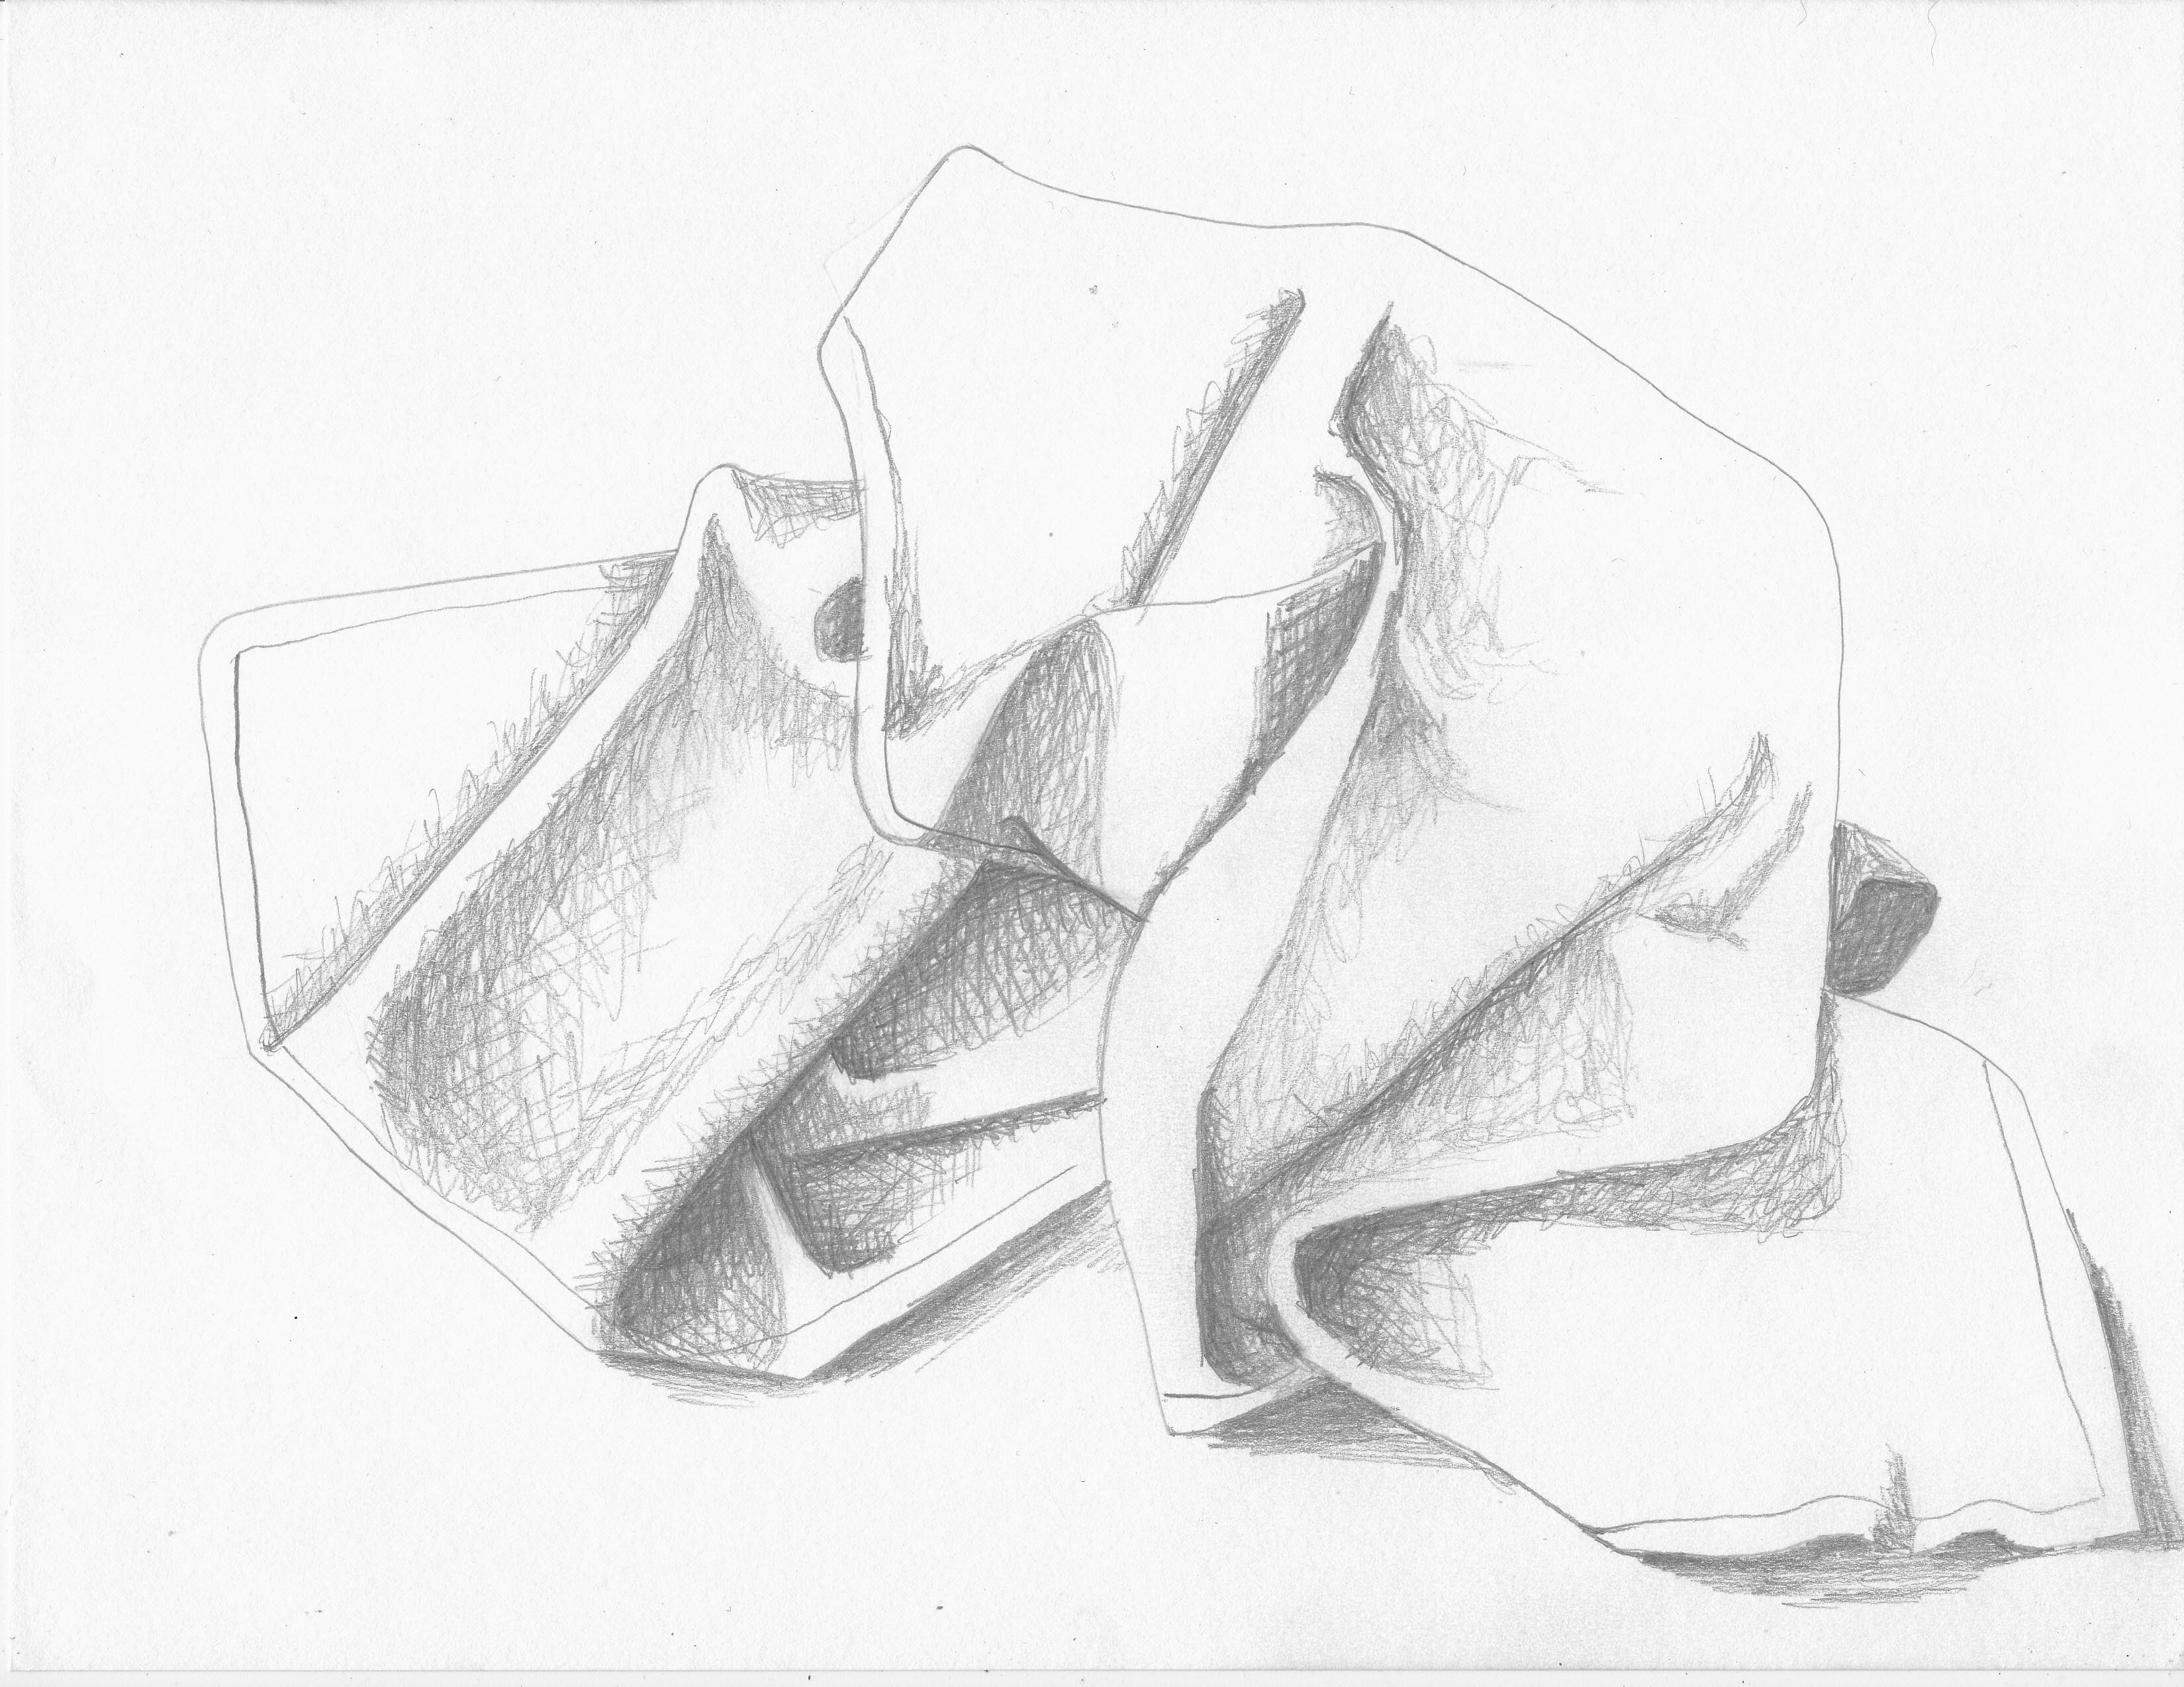 3299x2549 Sketch The Sketchbook Concern Page 10